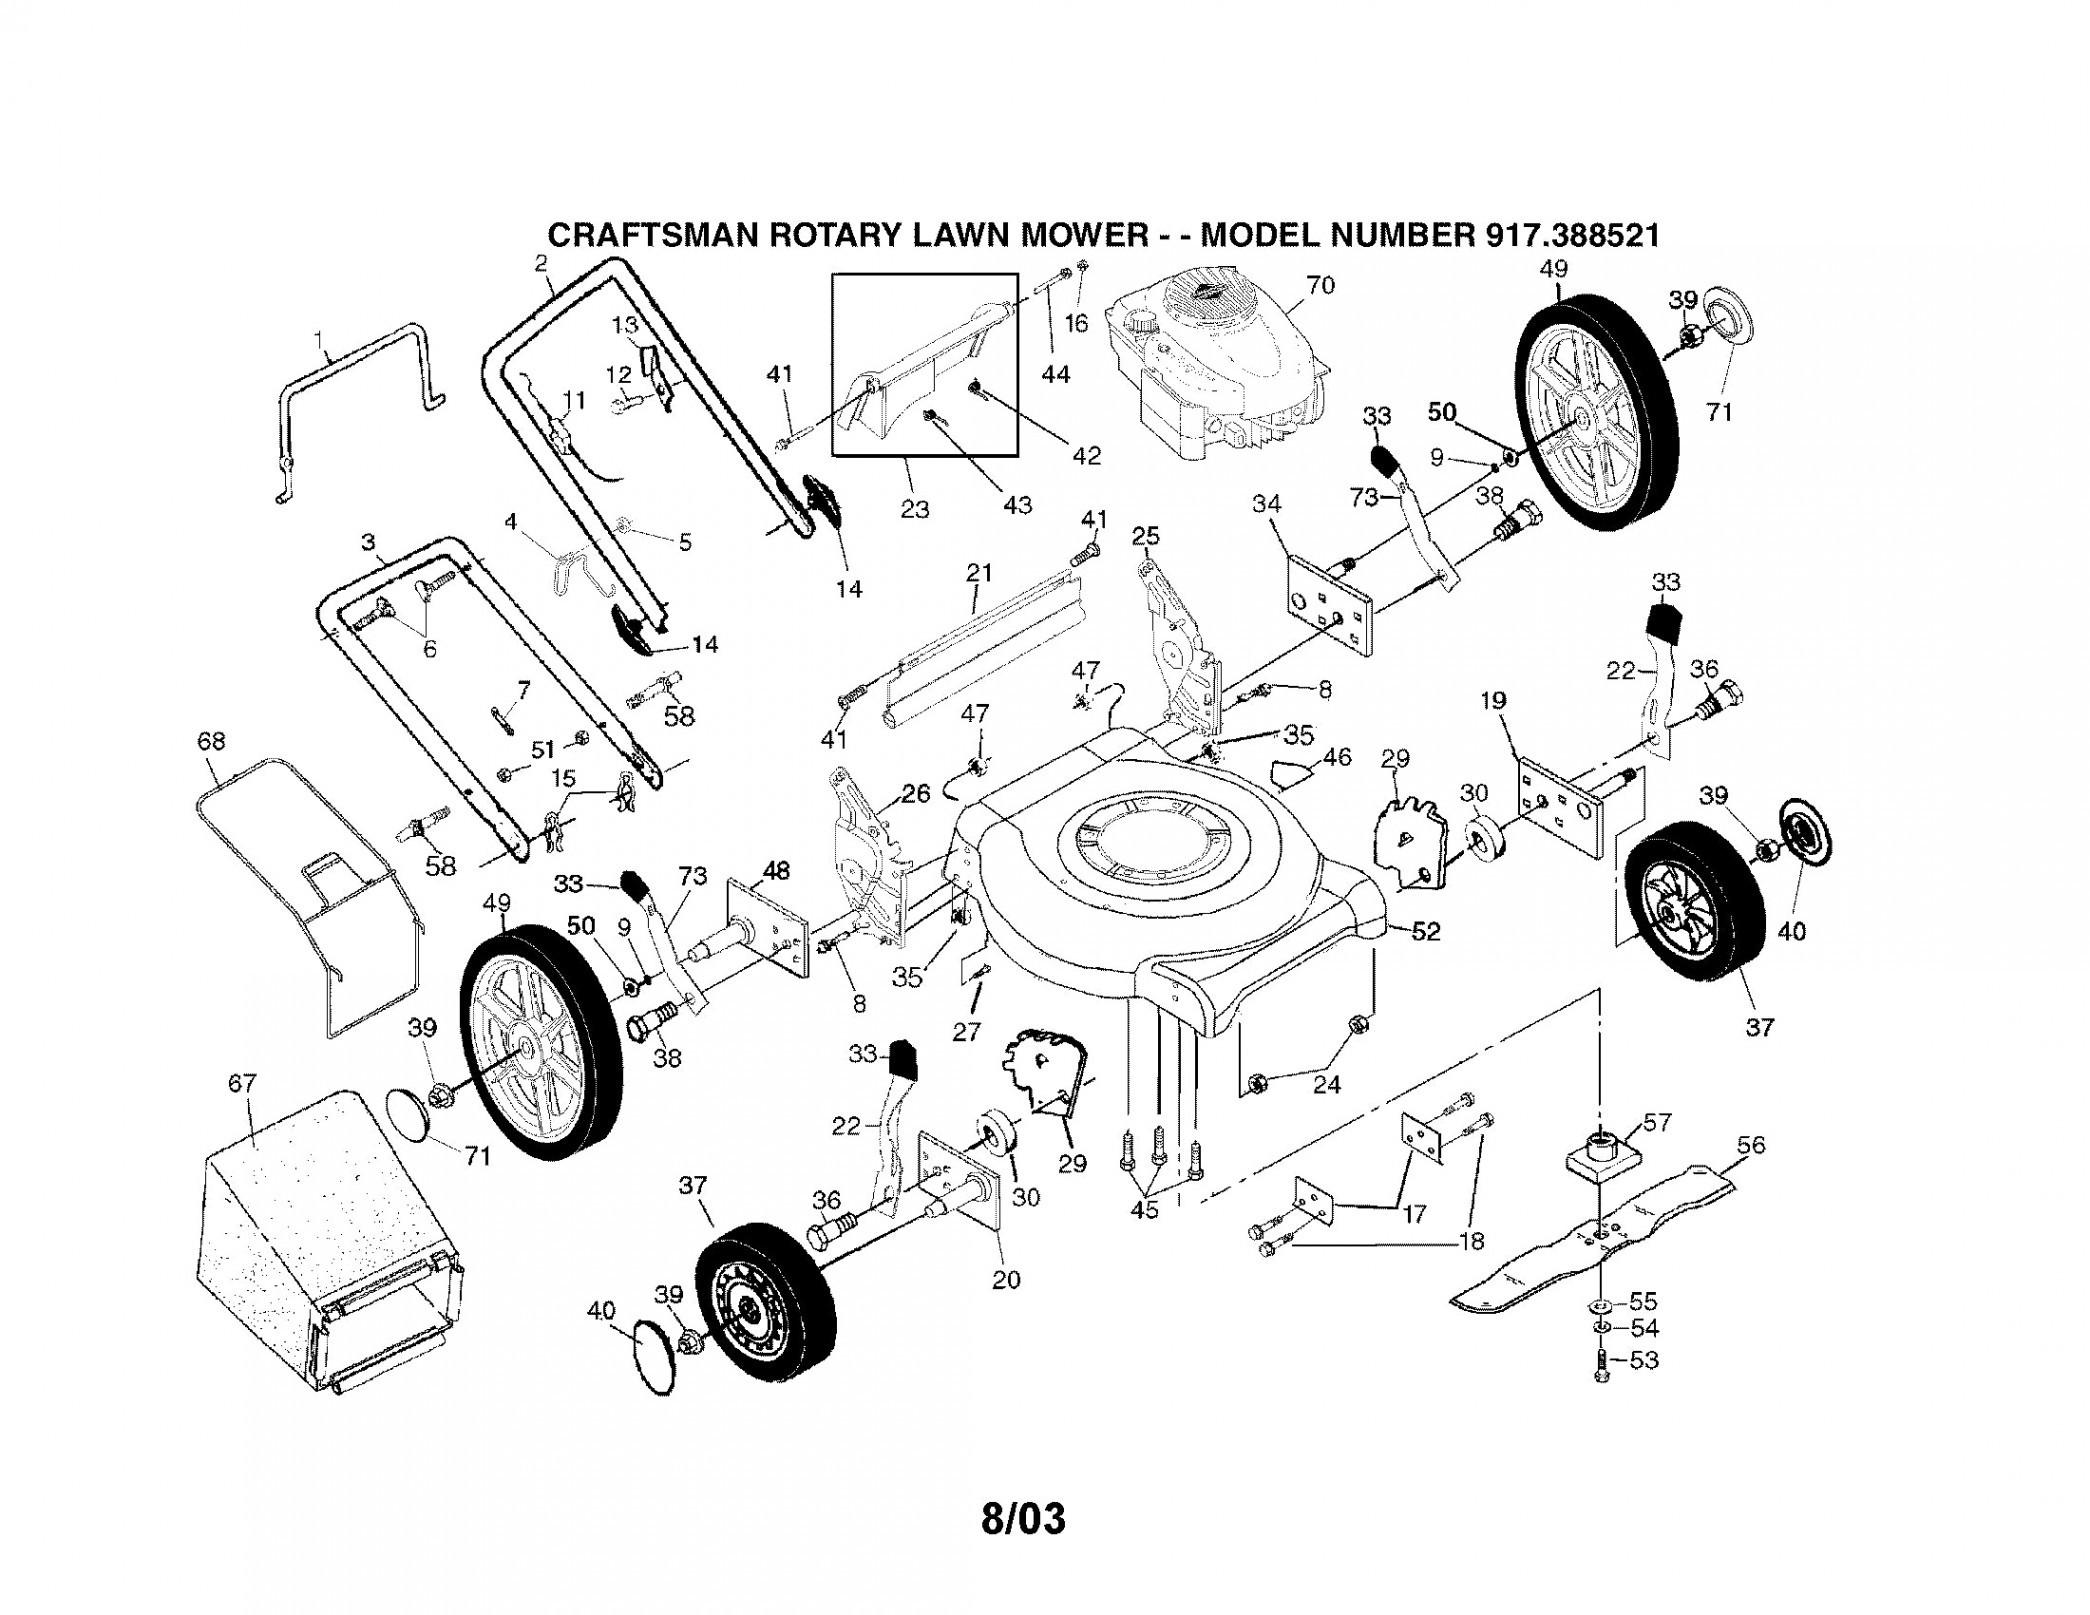 Briggs And Stratton Lawn Mower Parts Diagram